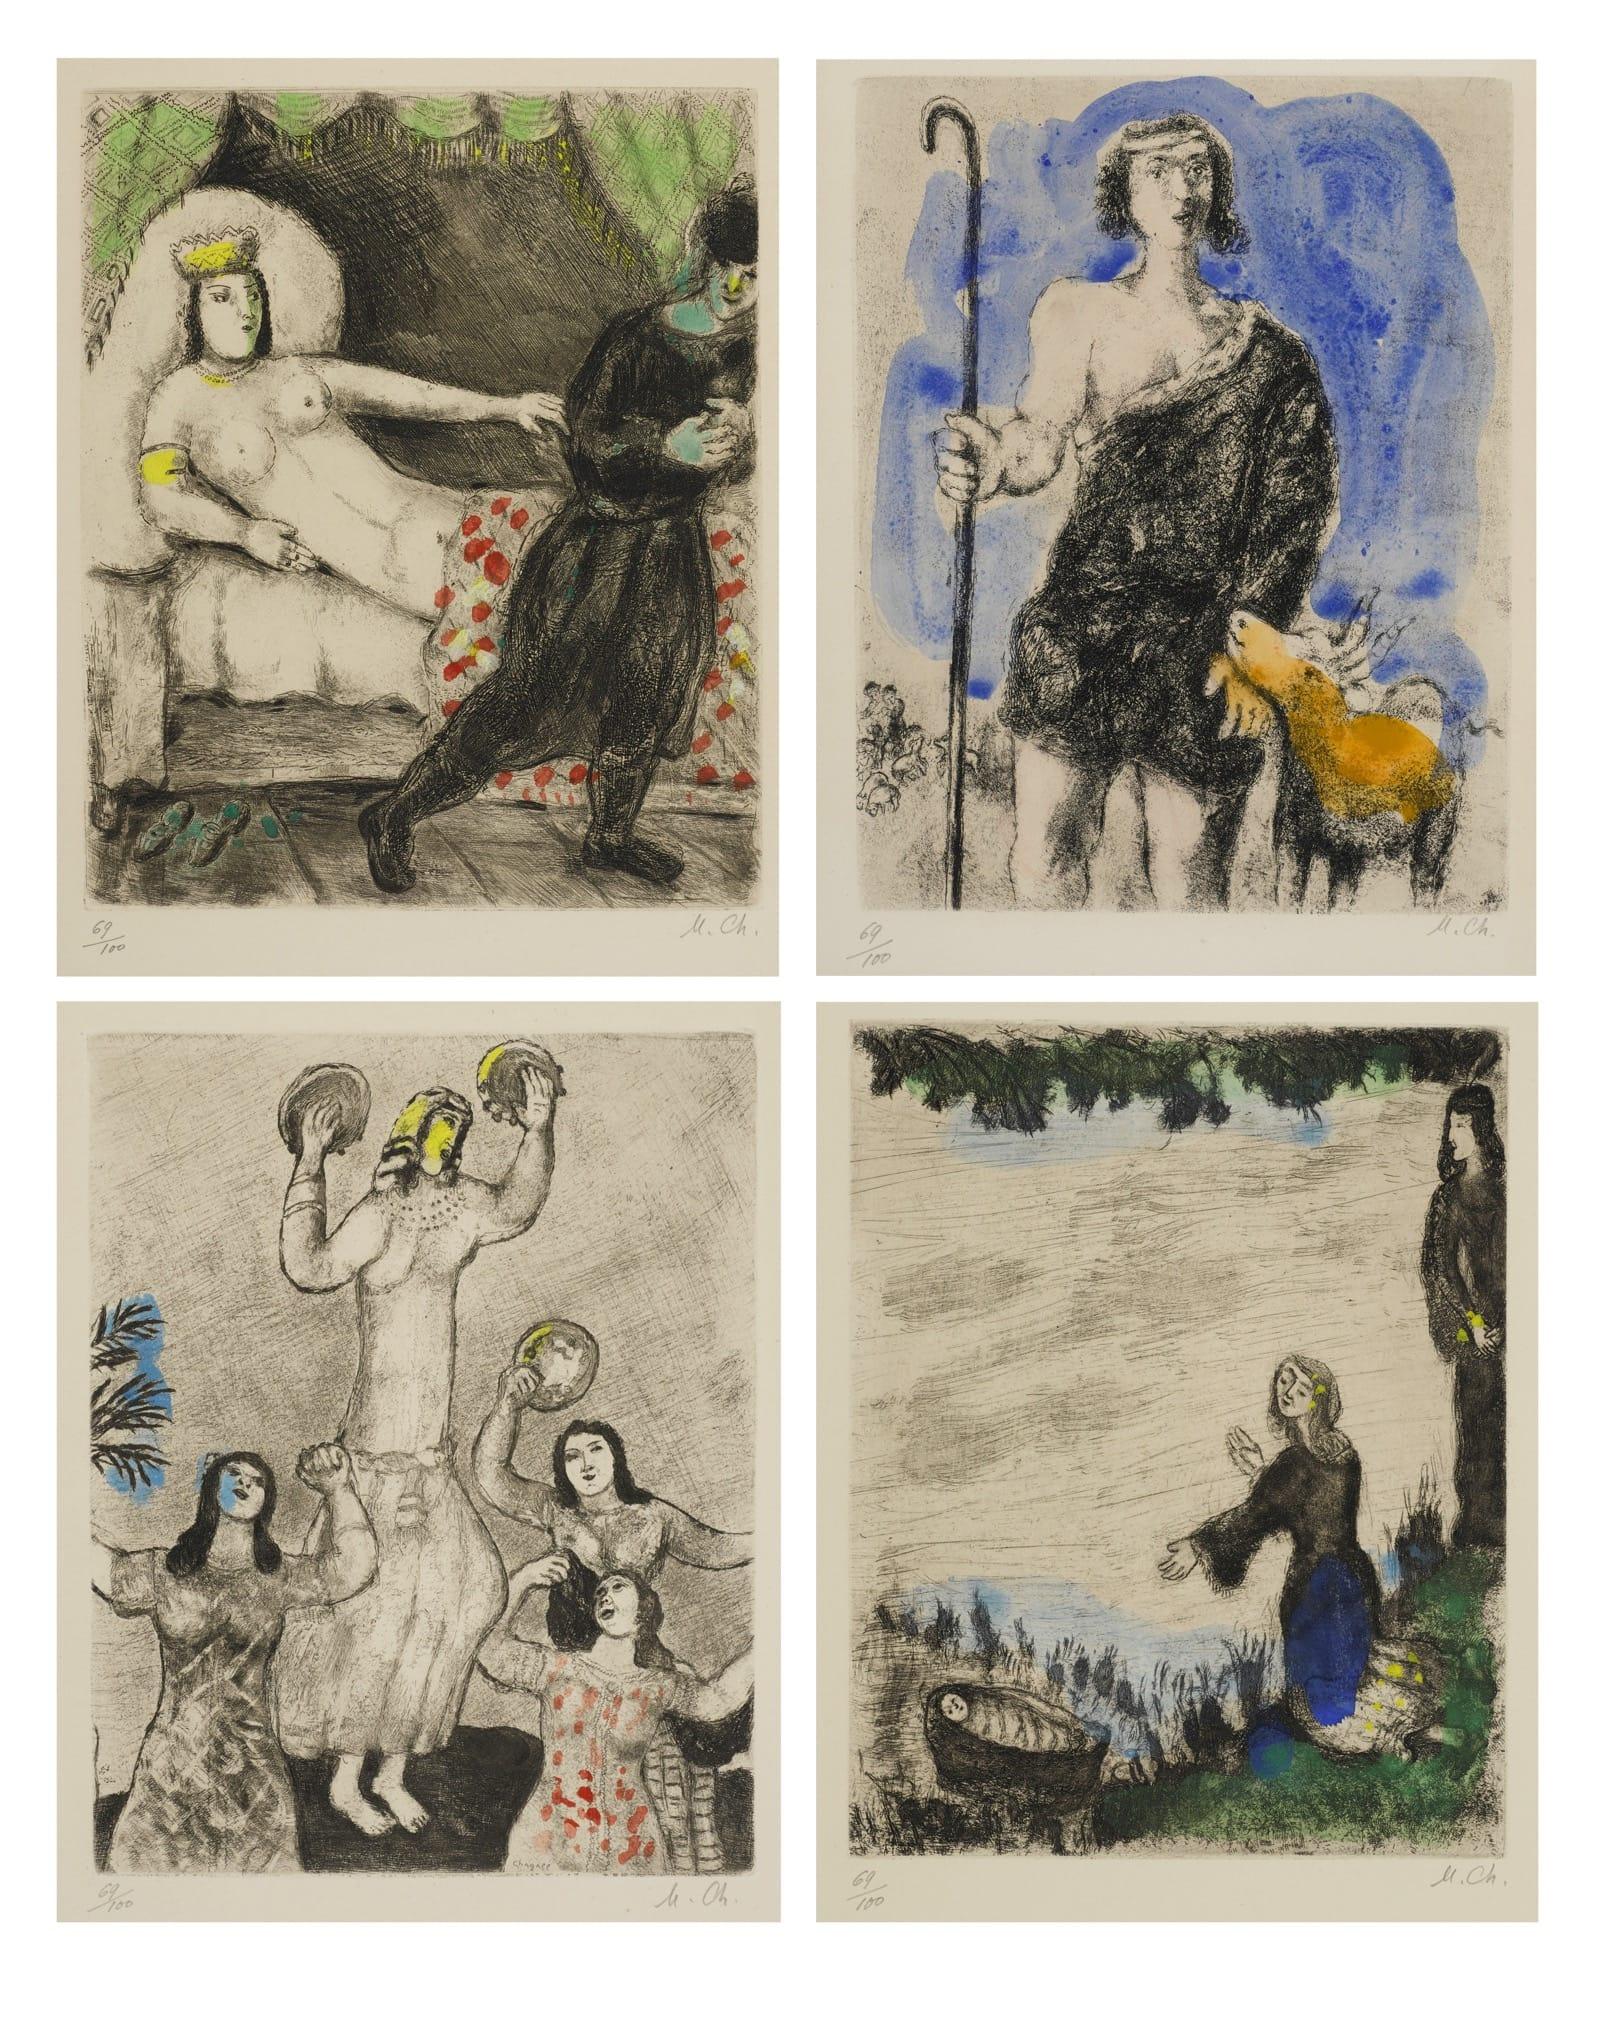 Marc Chagall,La Bible, 1931-1956, Etchings on Arches paper. Courtesy: Bonhams